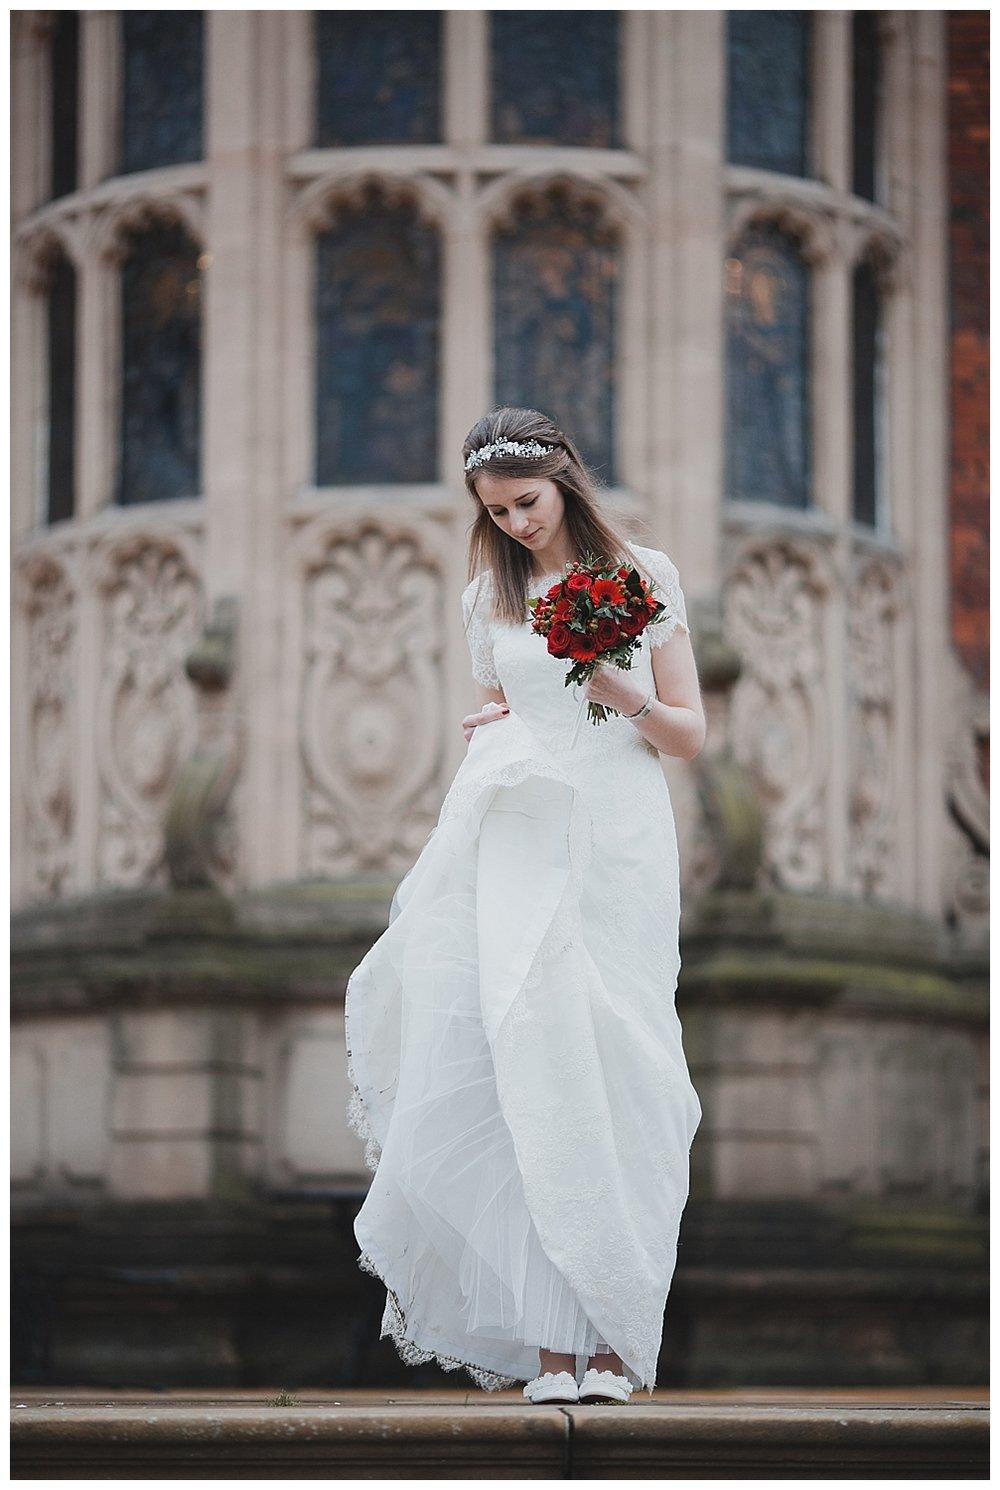 Bride checks her dress at her Cheshire wedding.